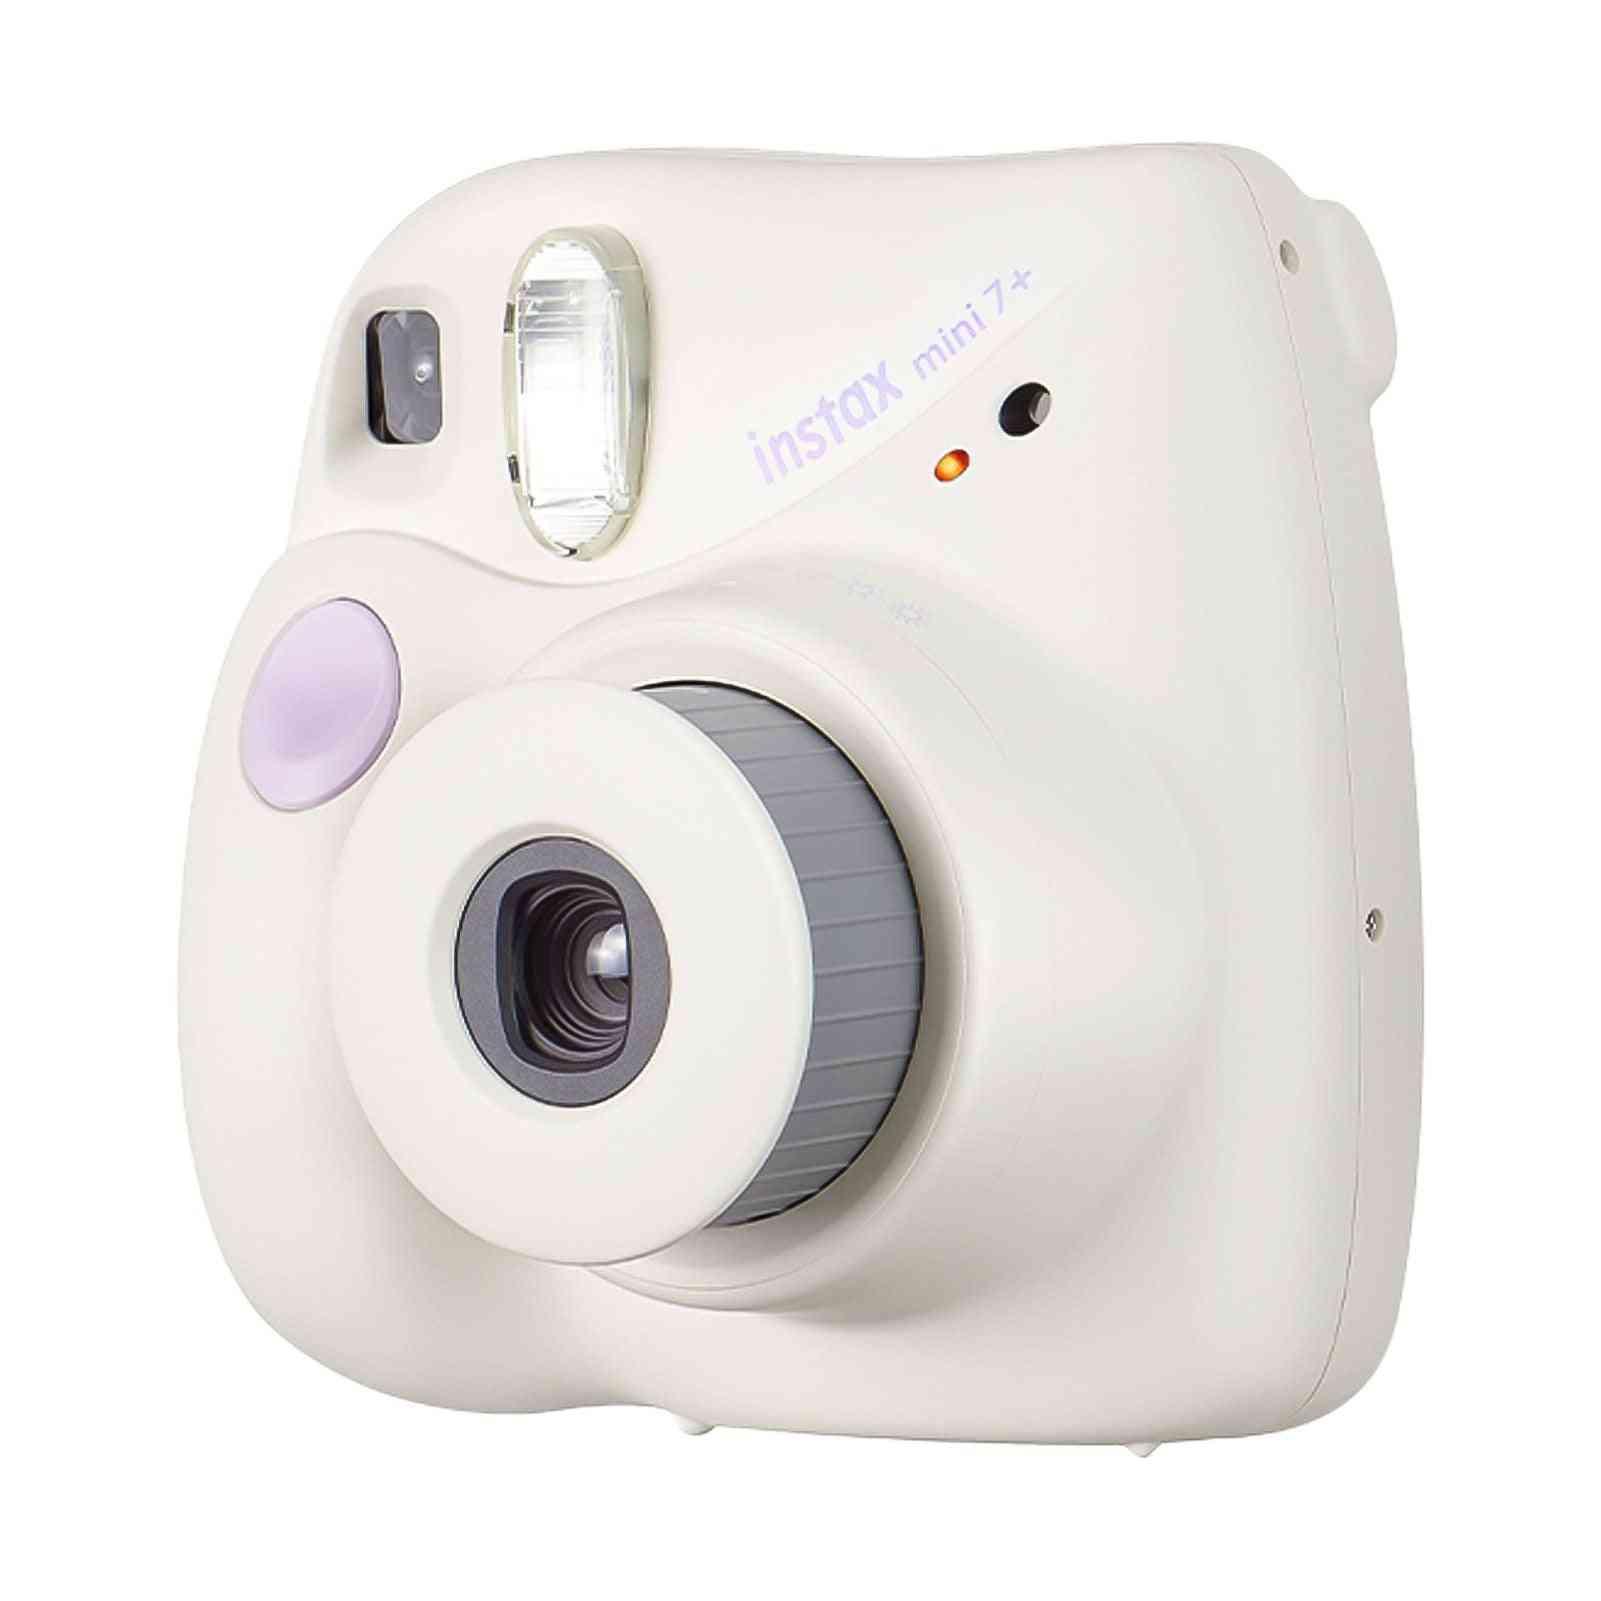 Instax Mini 7+ Instant Camera Film Cam Auto-focusing With Wrist Strap Birthday Christmas Festival For Kid